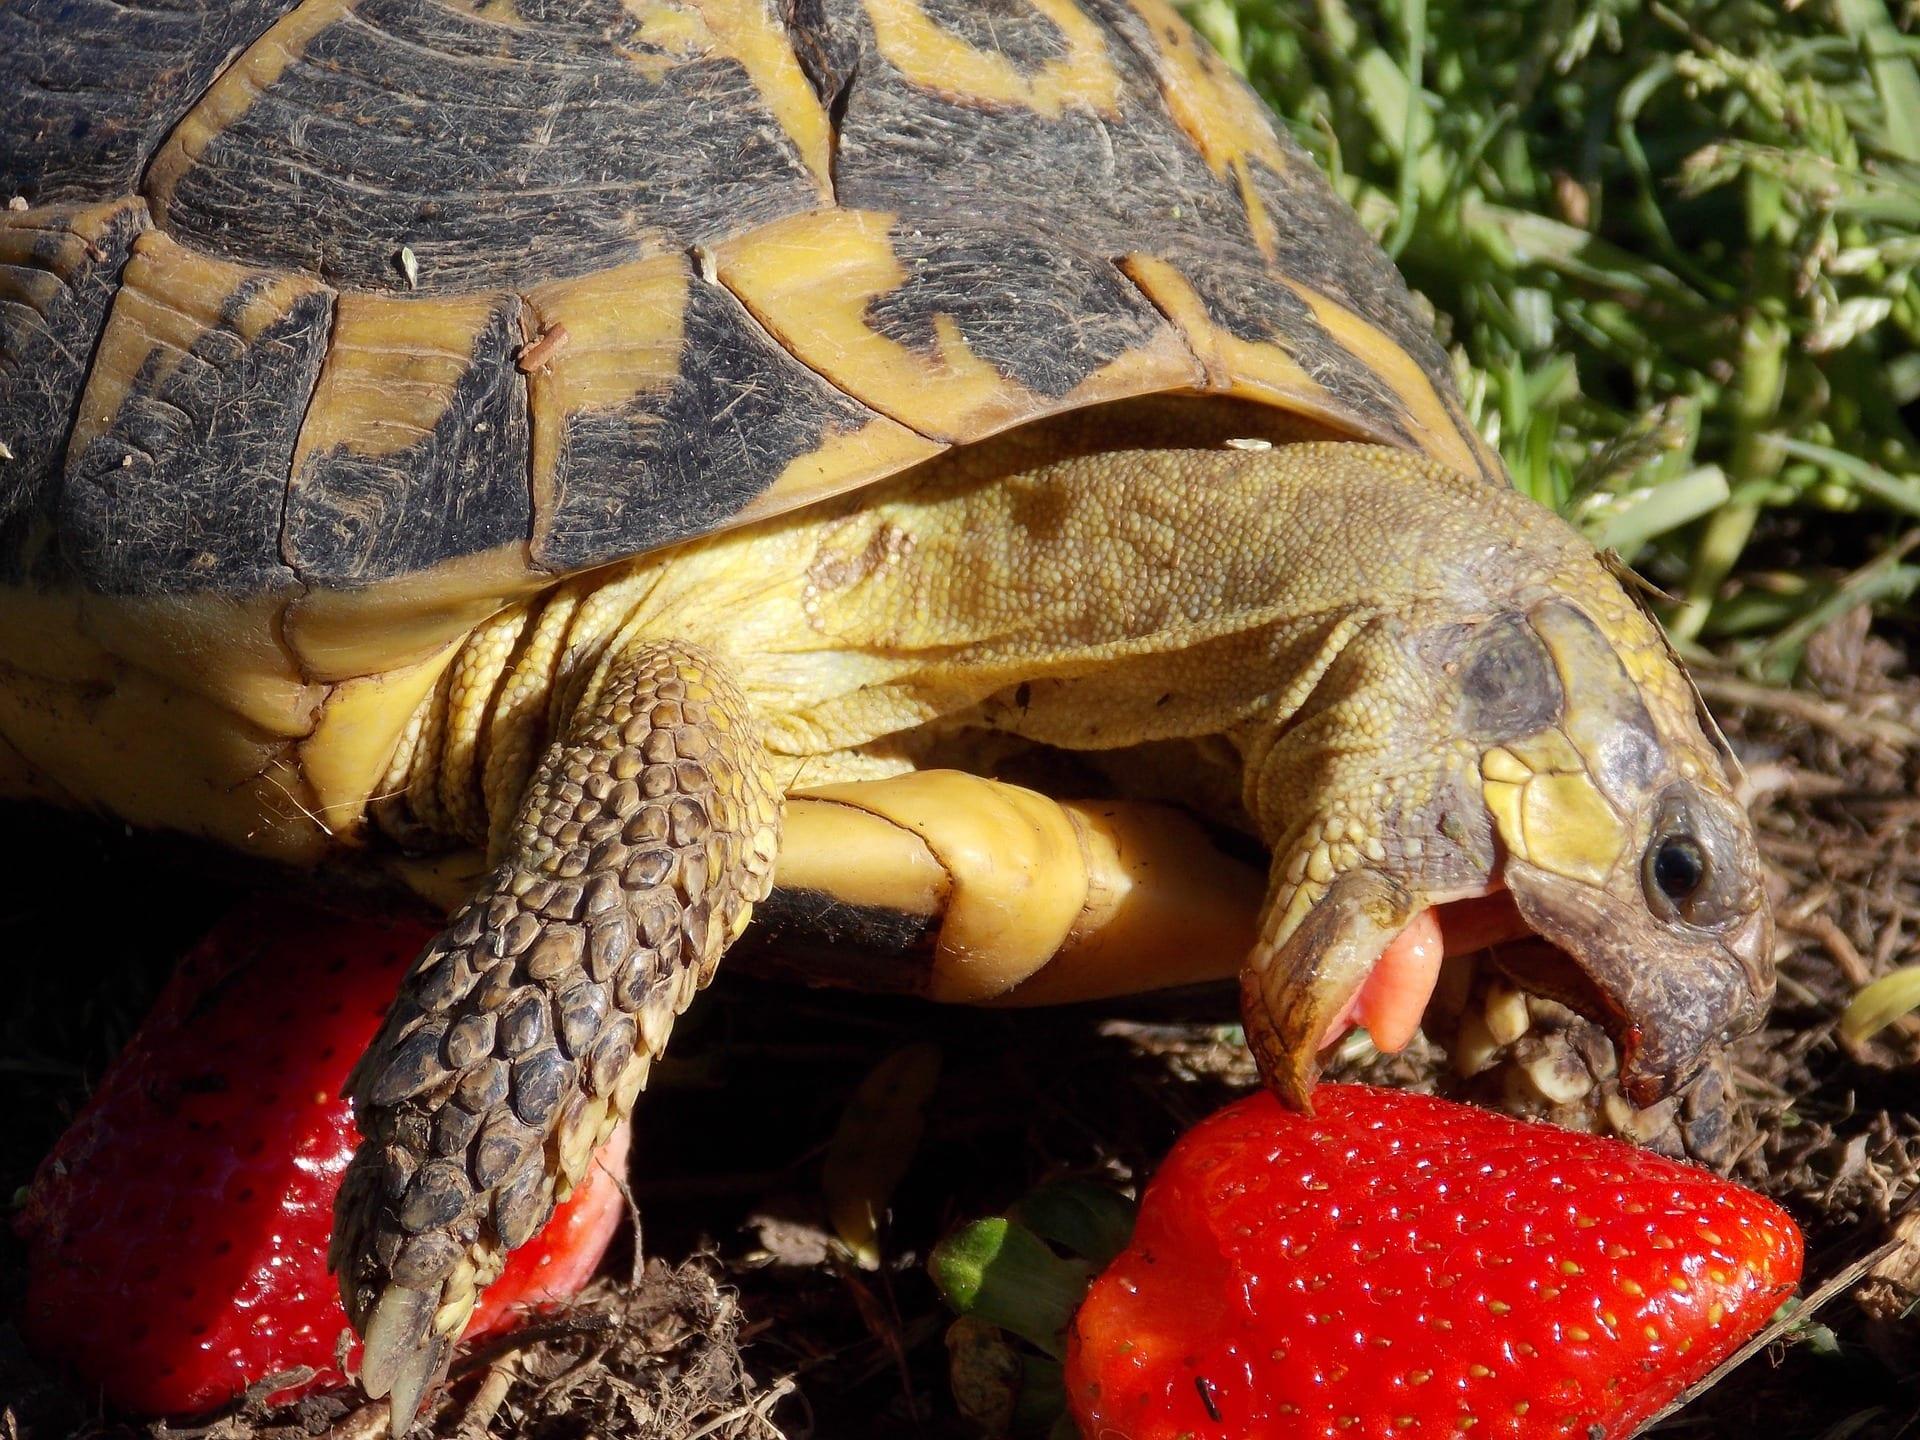 Turtle Position